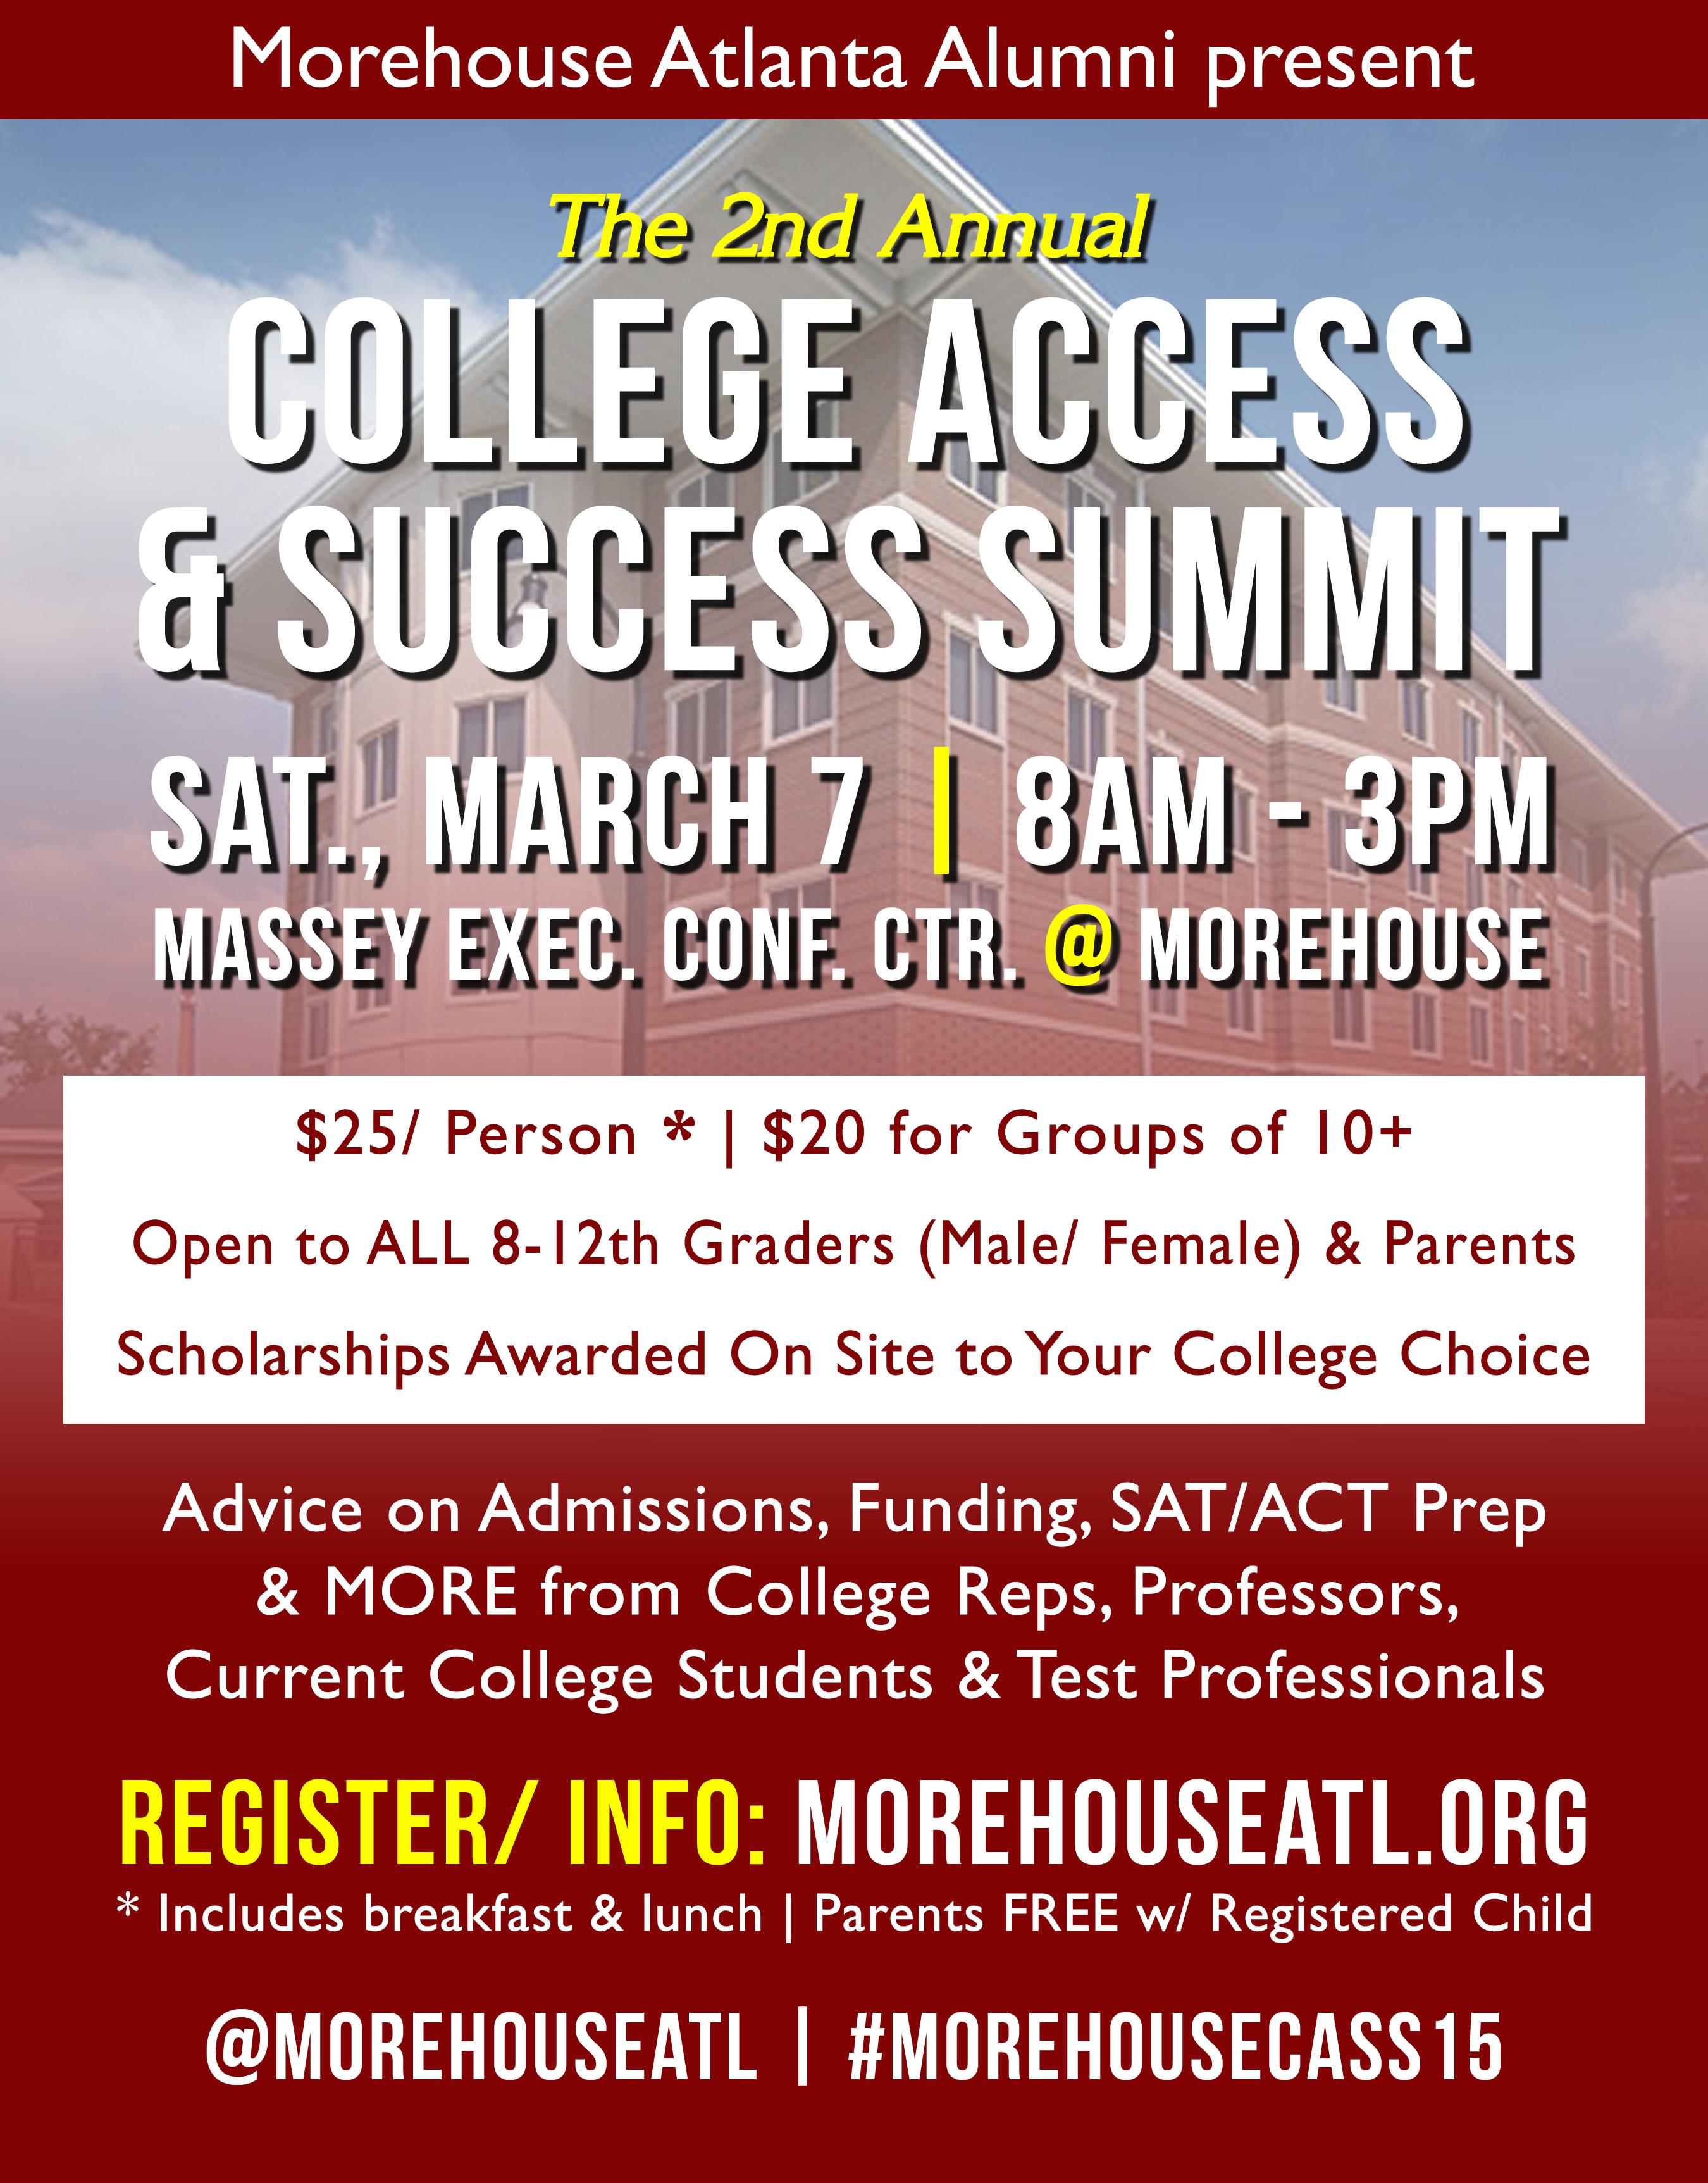 morehouse atlanta alumni to host college access and success summit morehouse atlanta alumni to host college access and success summit morehouse college alumni association